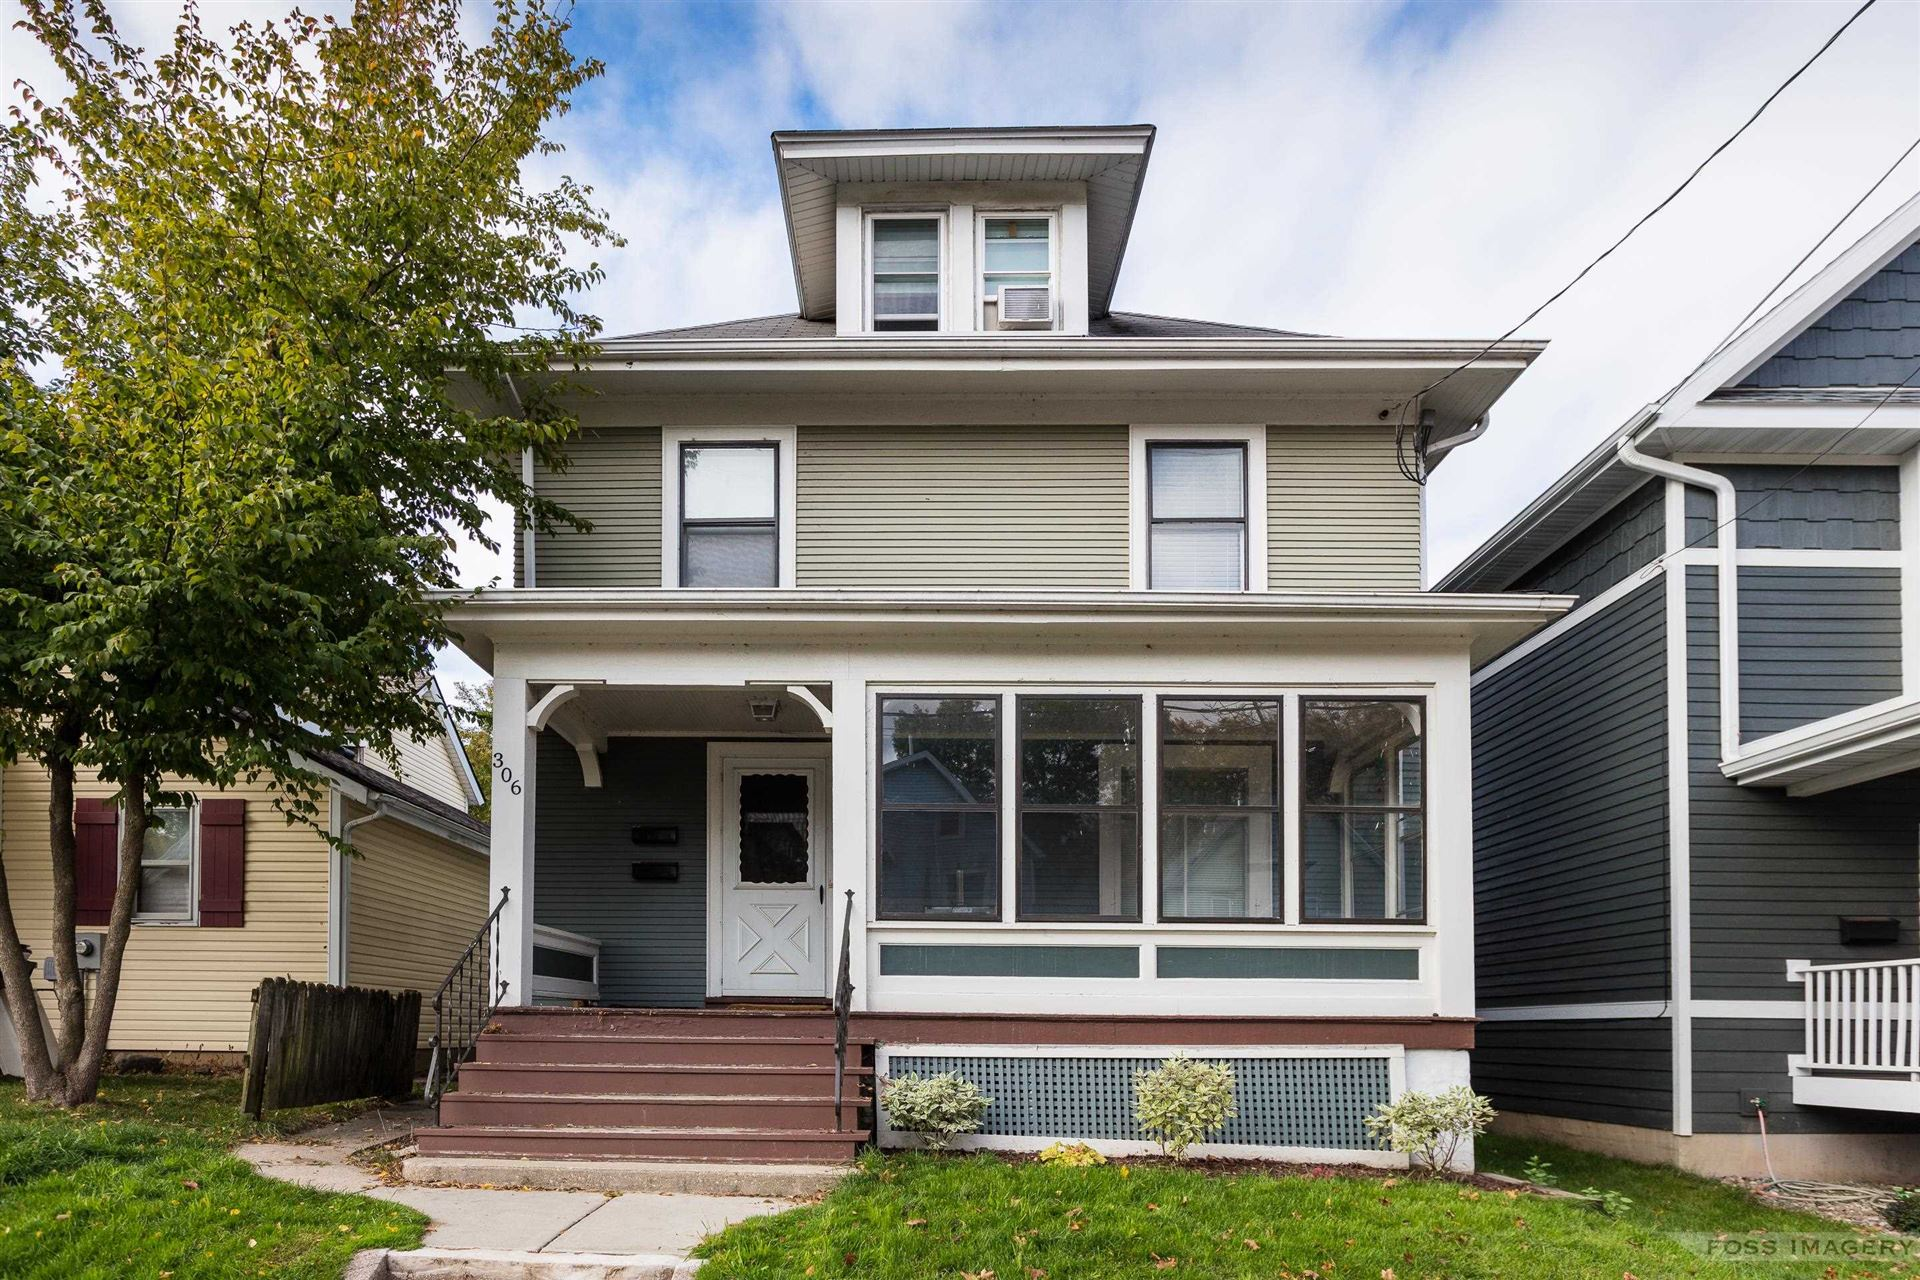 306 S Baldwin St, Madison, WI 53703 - #: 1920166